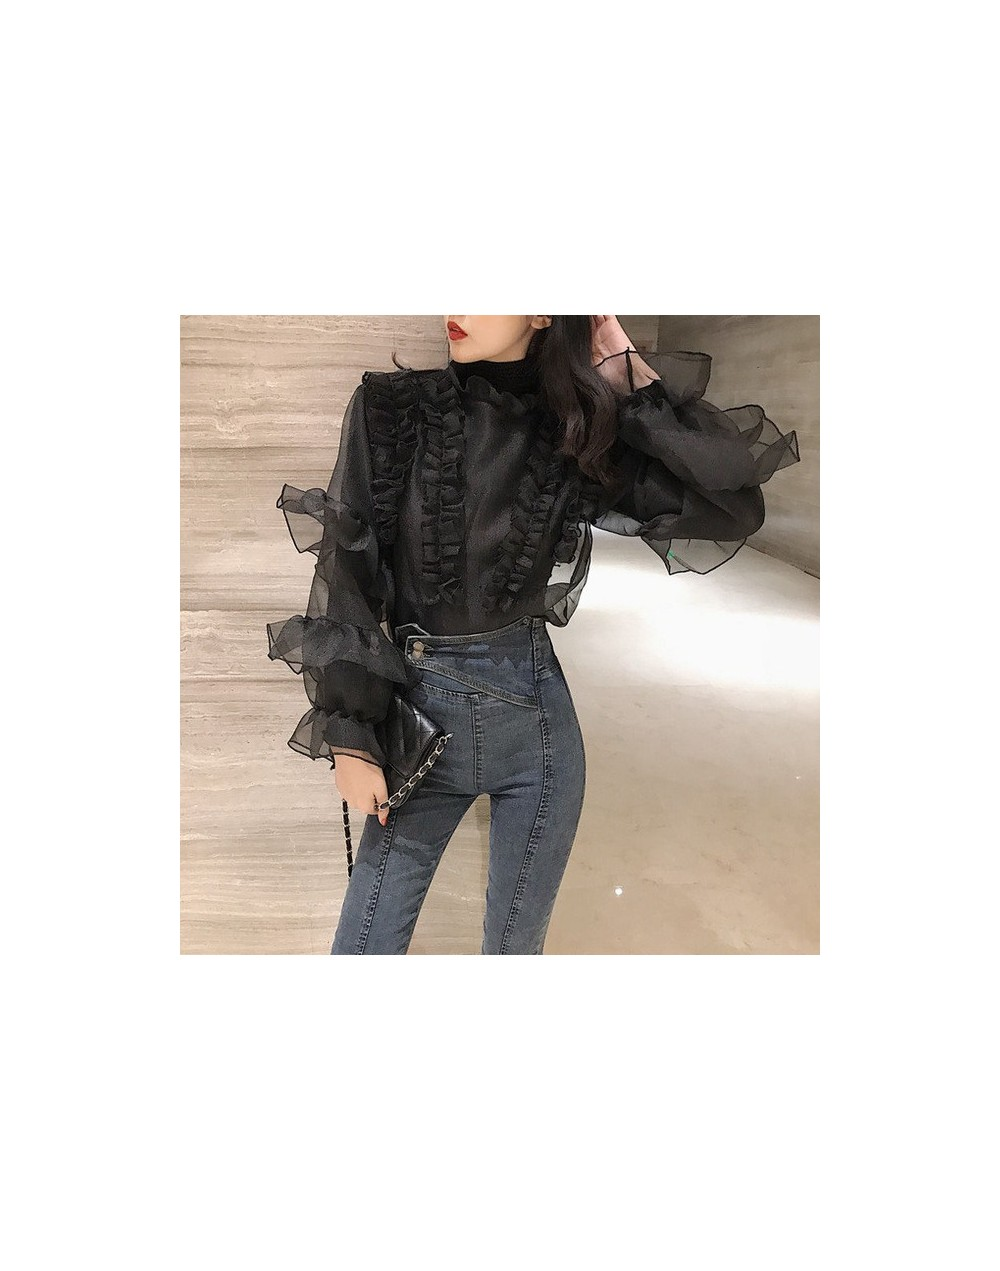 Ruffles High Collar Vintage Blouse Shirt Women Flare Long Sleeve Elegant Female Blouse Casual Summer Chiffon Blusas female 2...